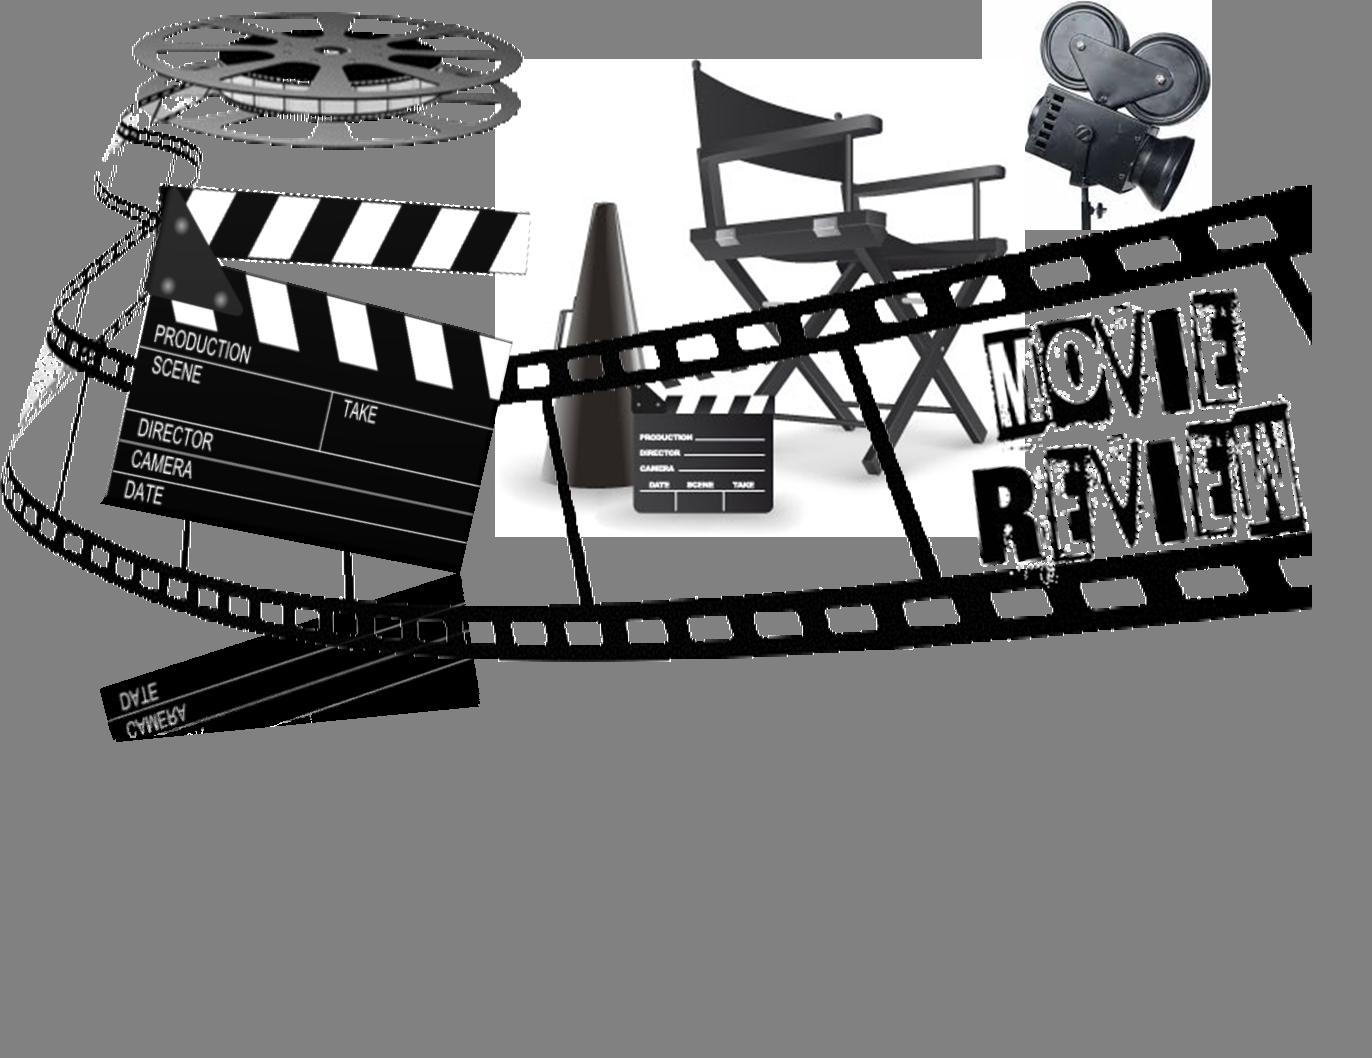 Journalist clipart movie critic #15